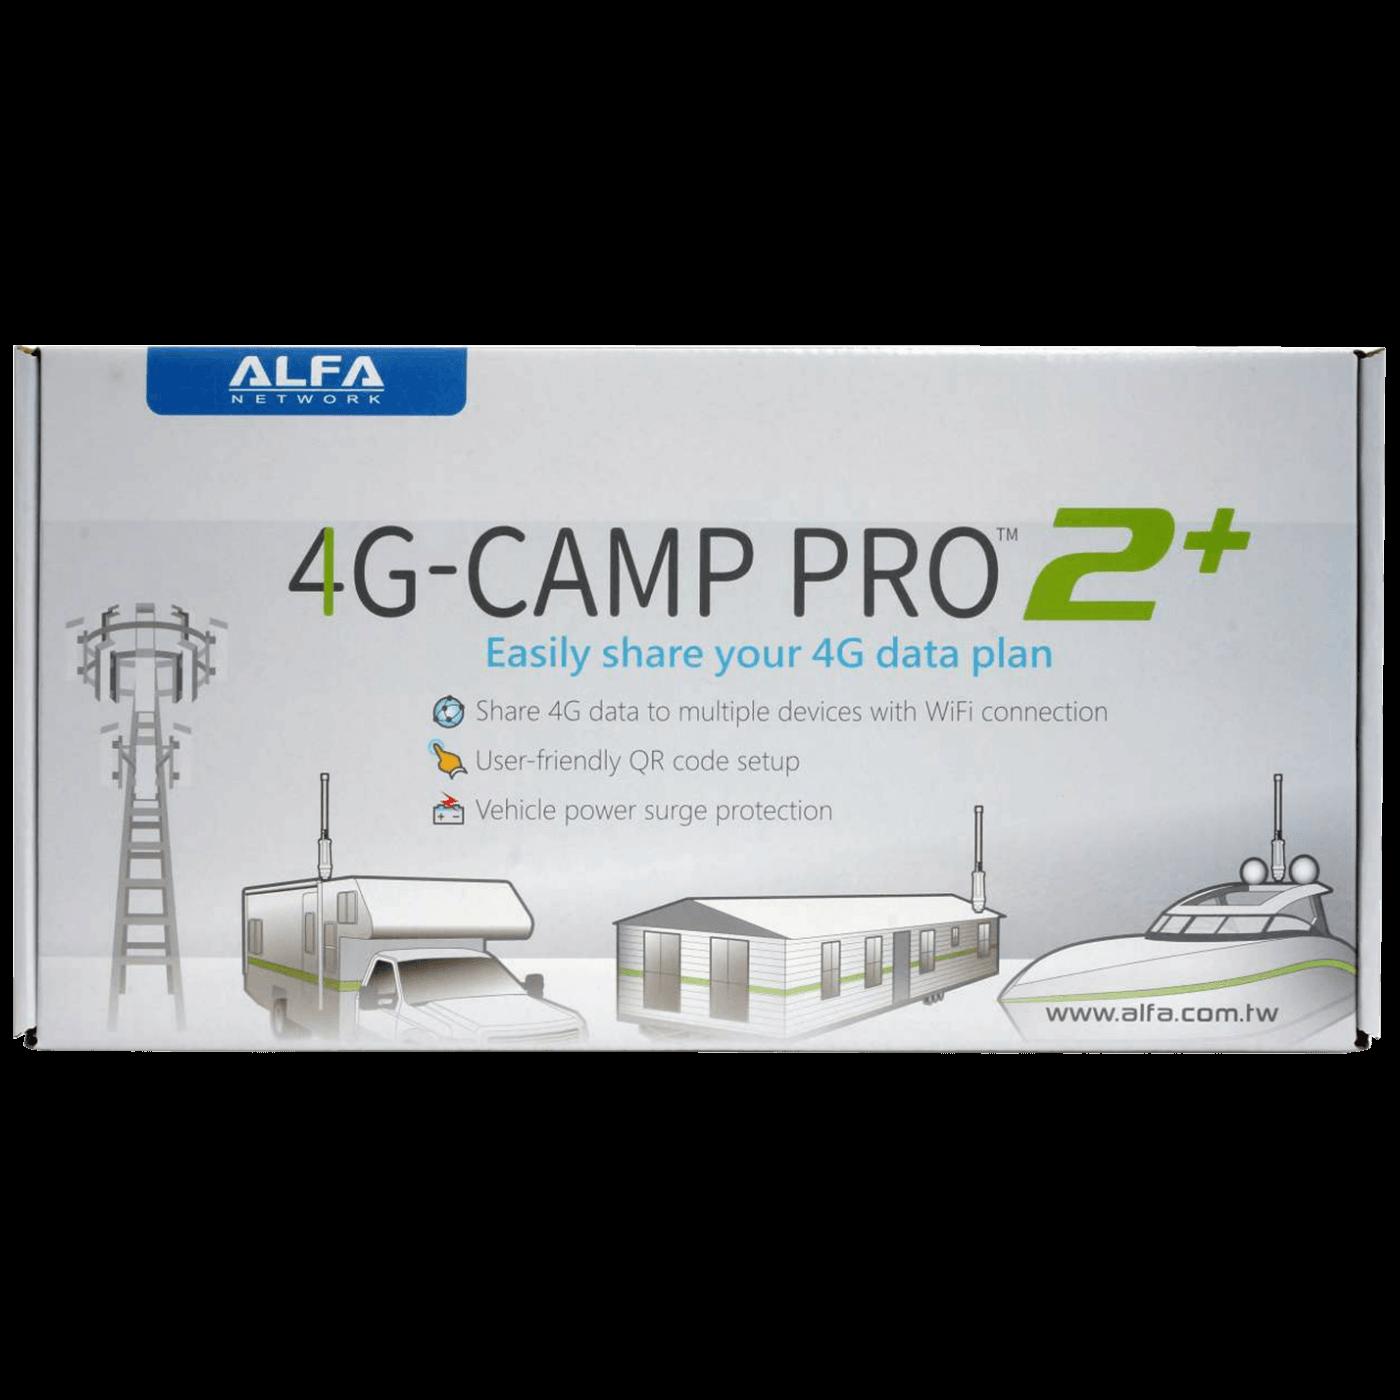 4G-CAMP PRO 2+